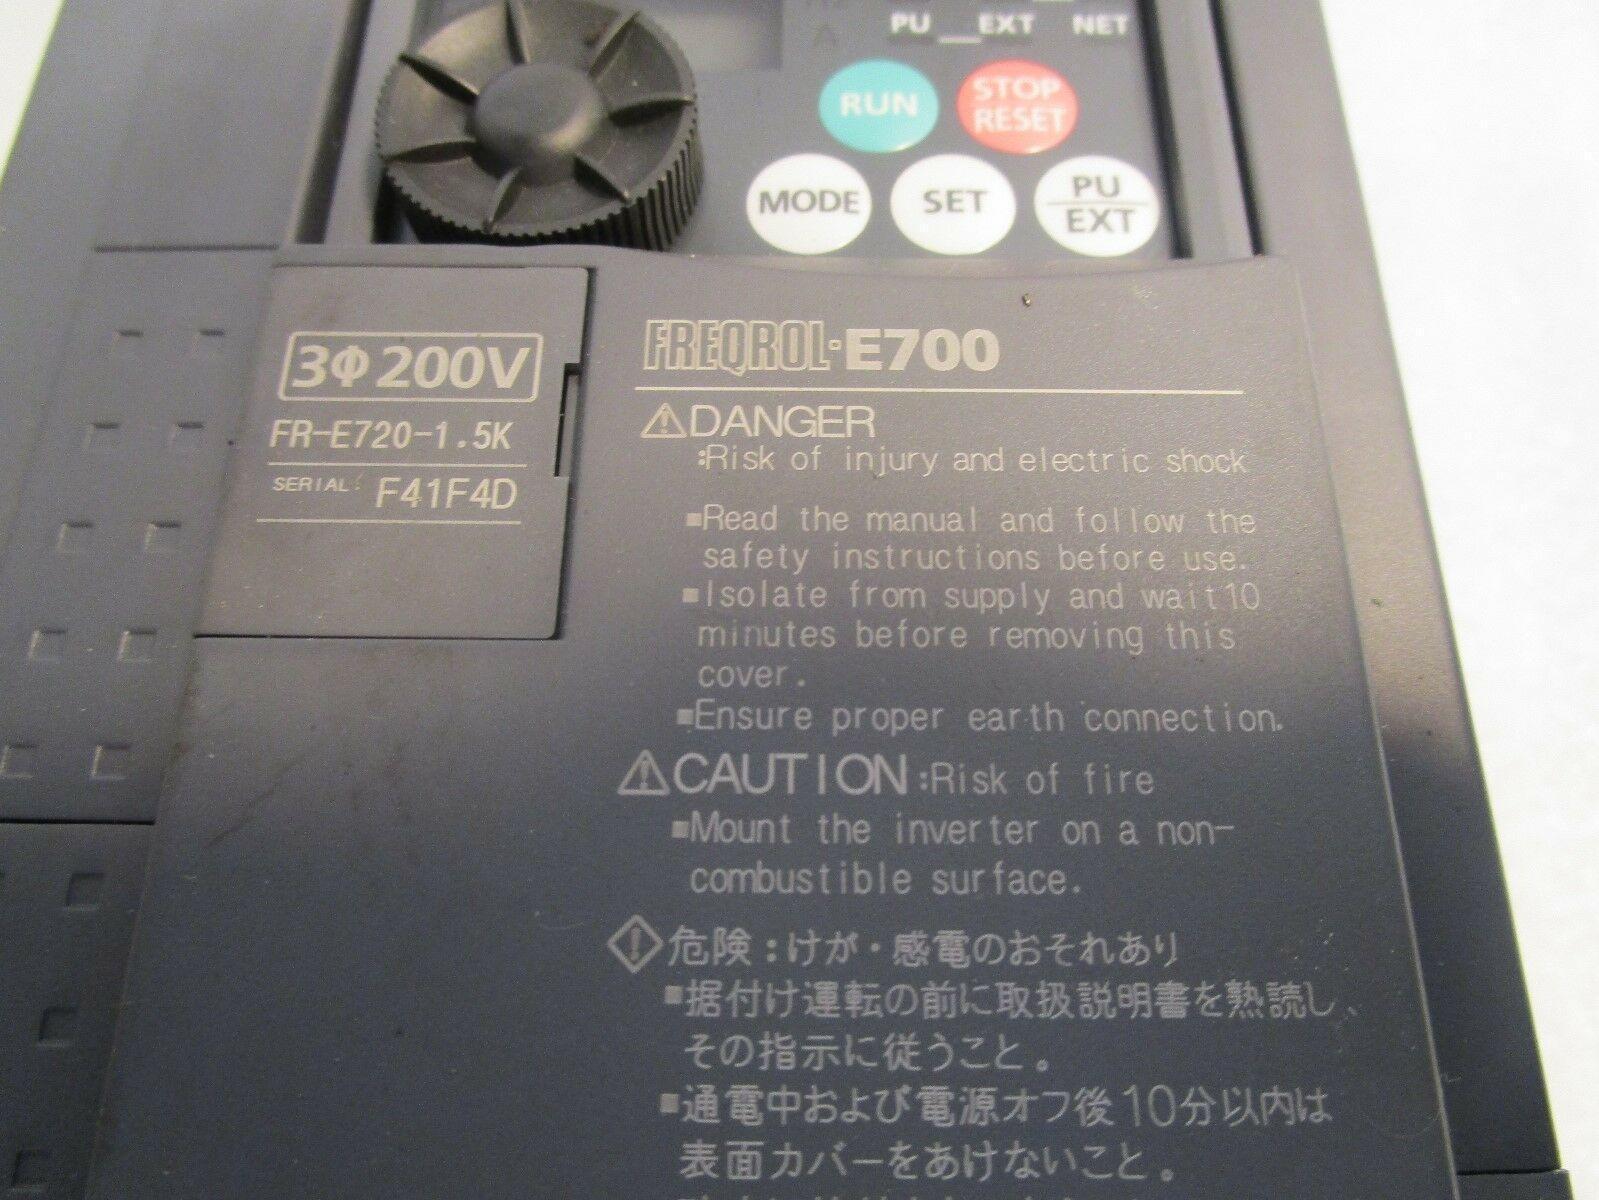 Mitsubishi Freqrol E700 Motor Controller FR-E720-1.5K